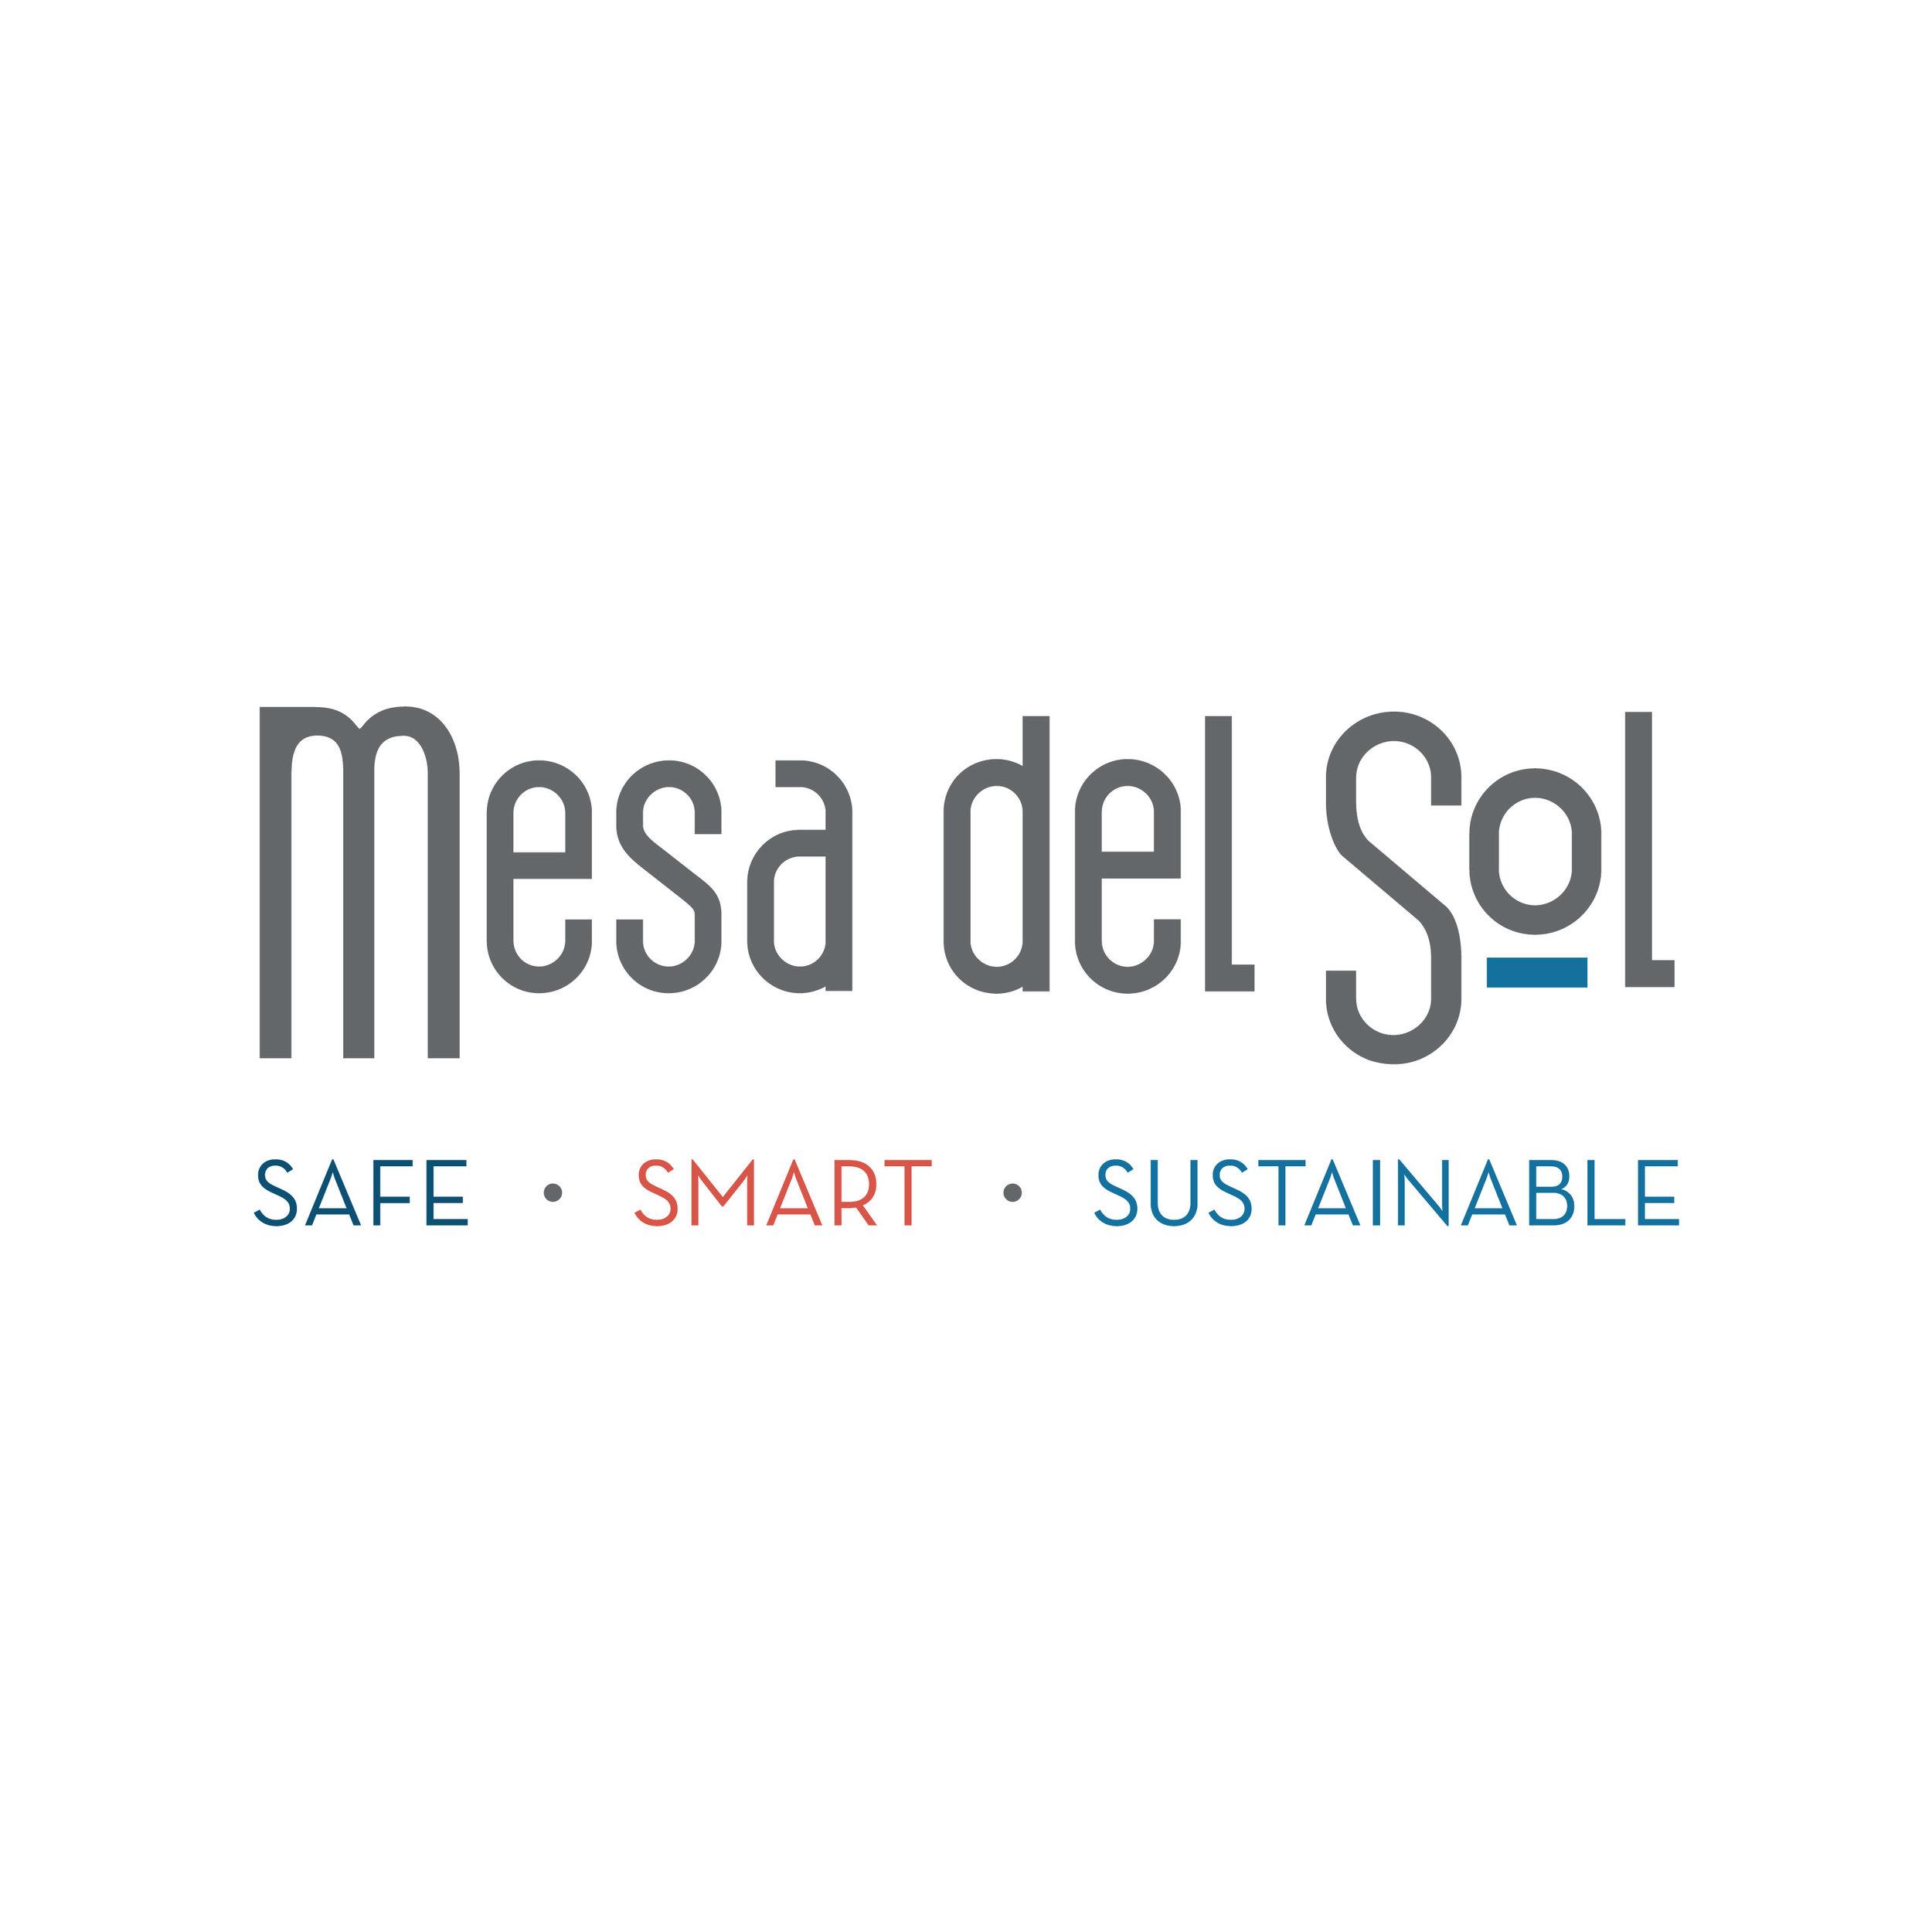 MdS-Logo-Color-tagline-LRG.jpg